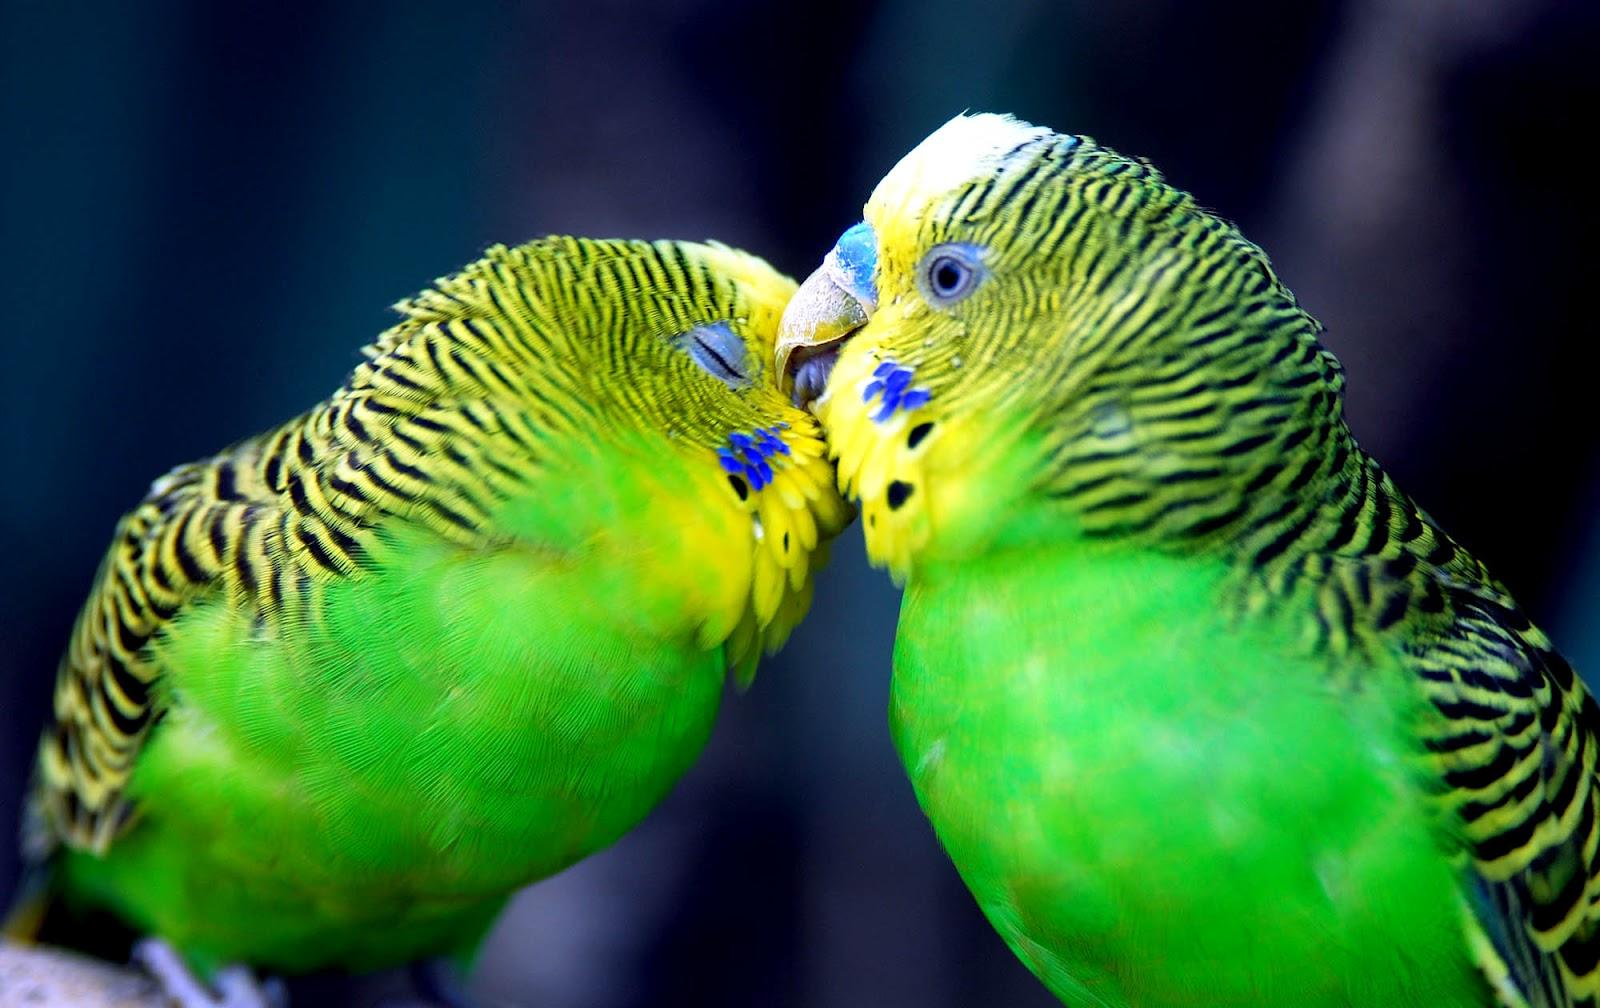 Cute Love Birds Kissing